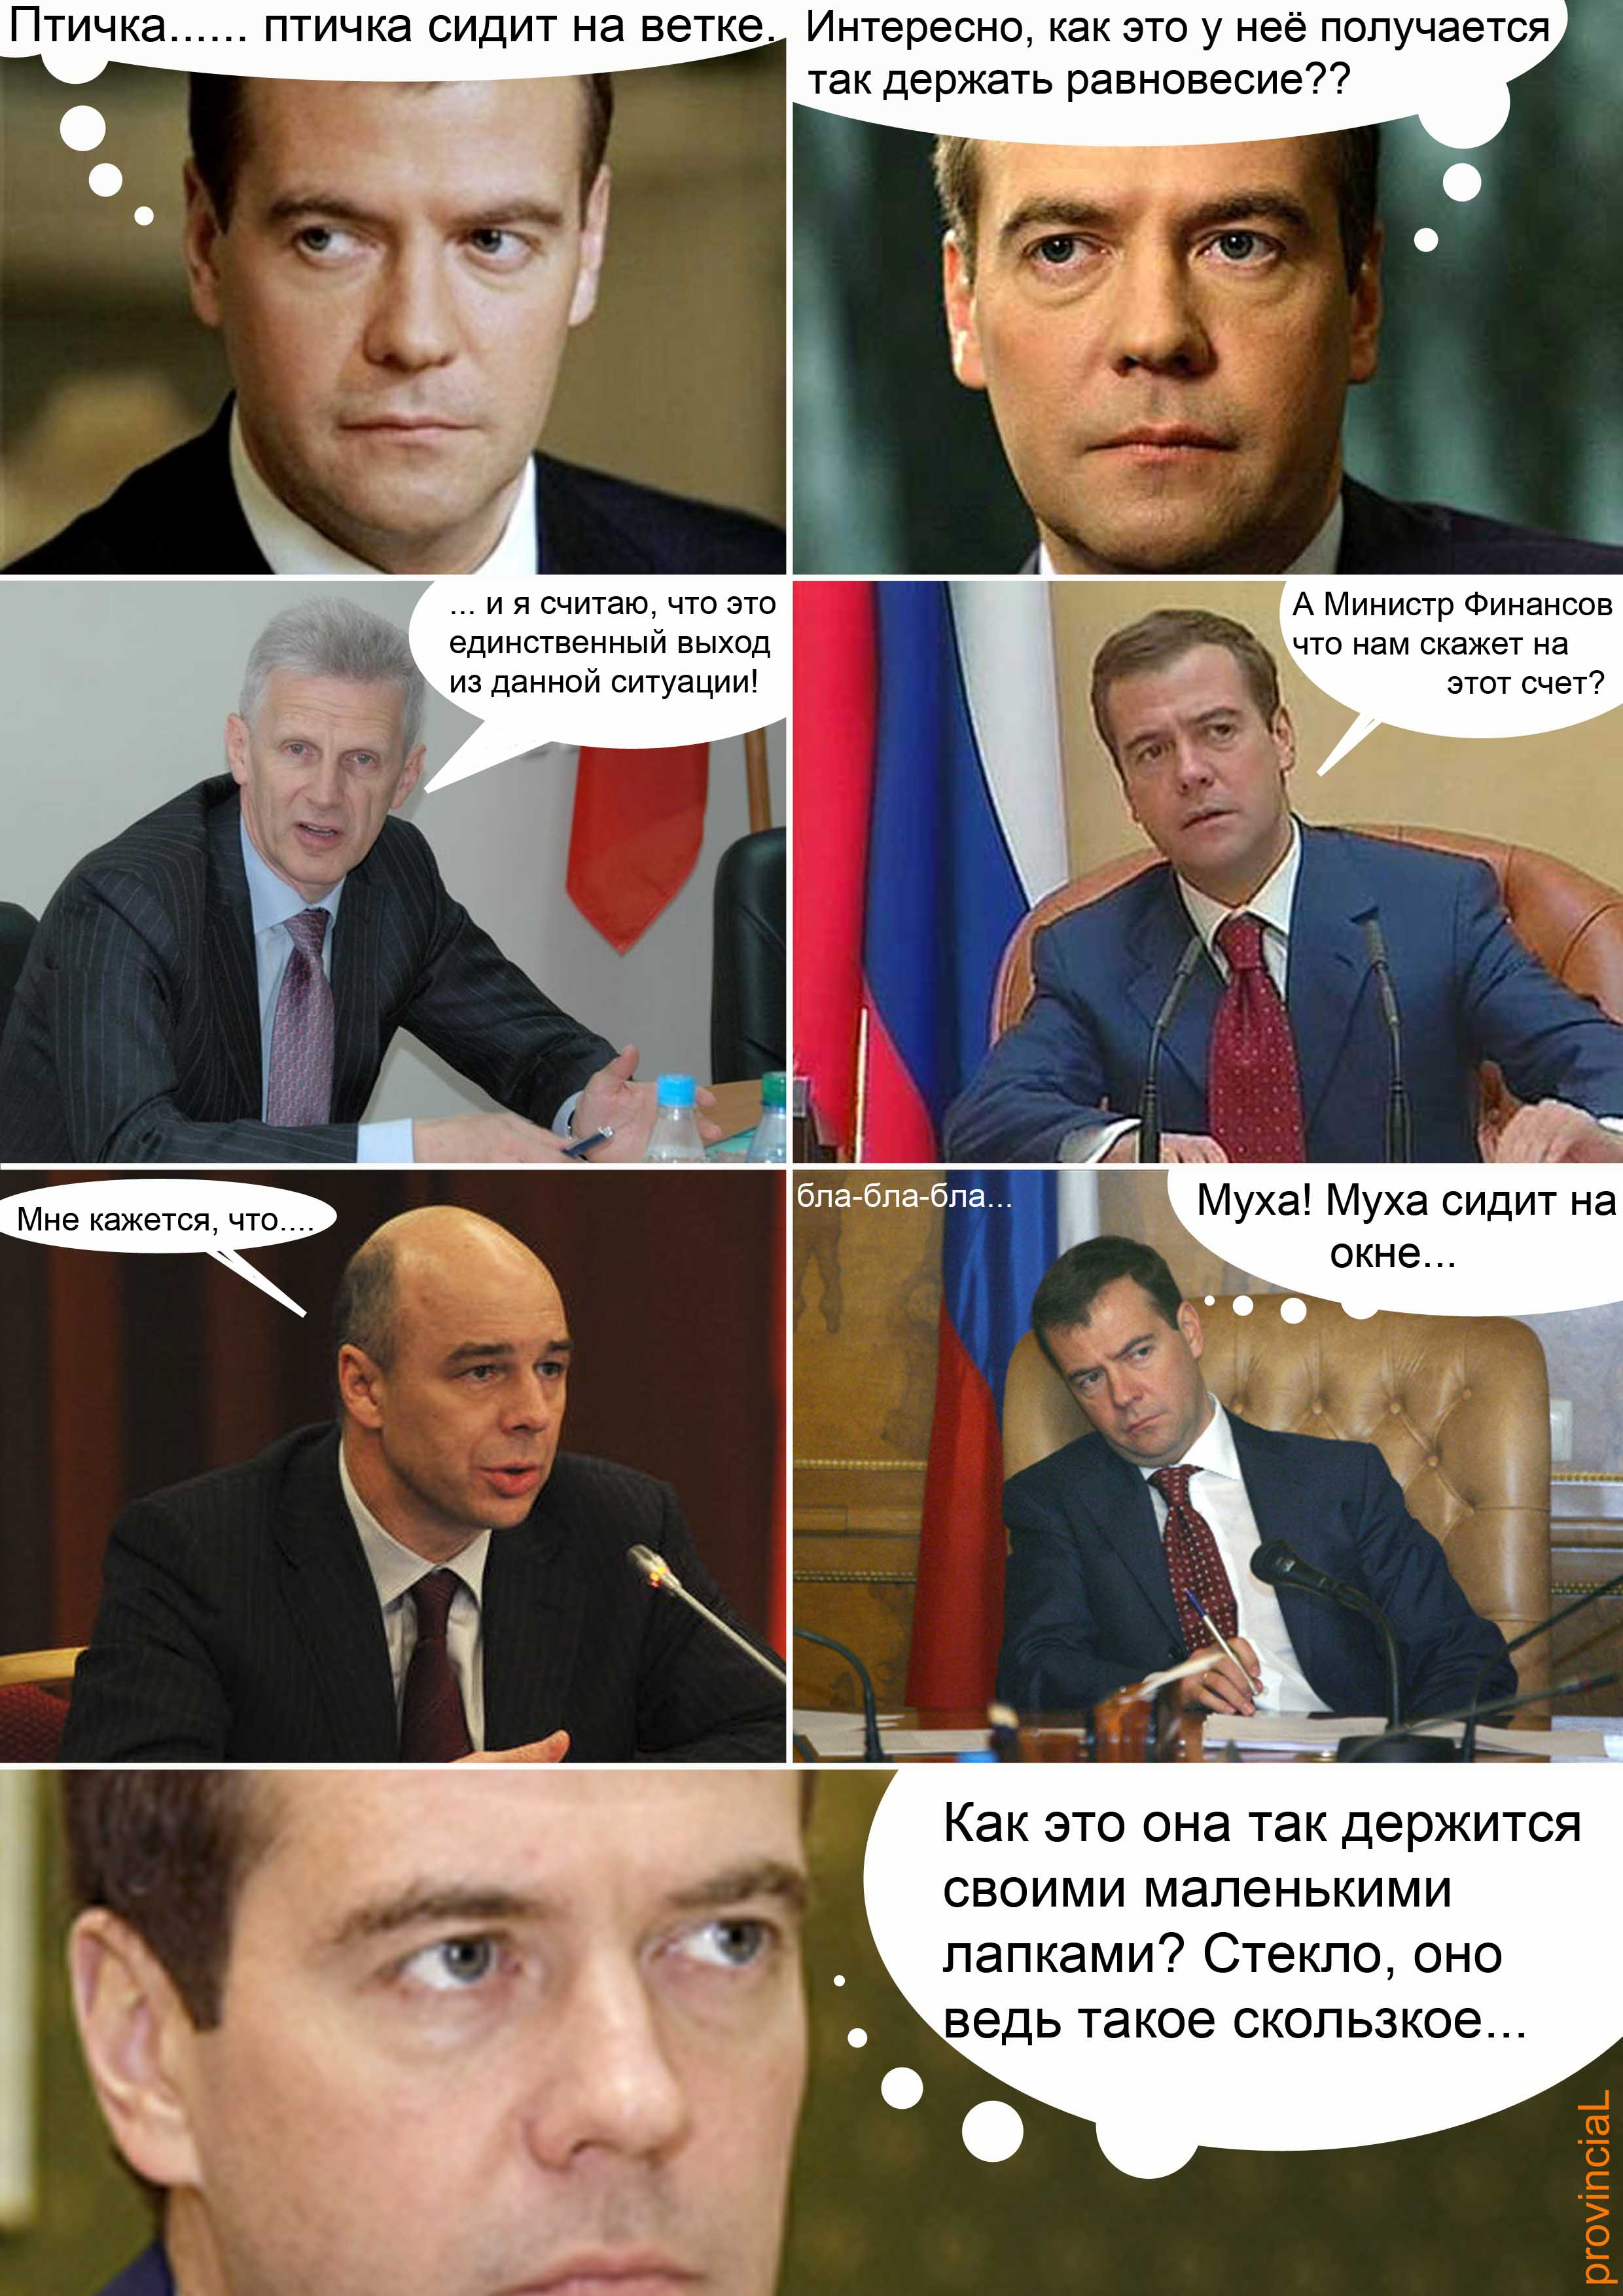 Картинки анекдоты про политику